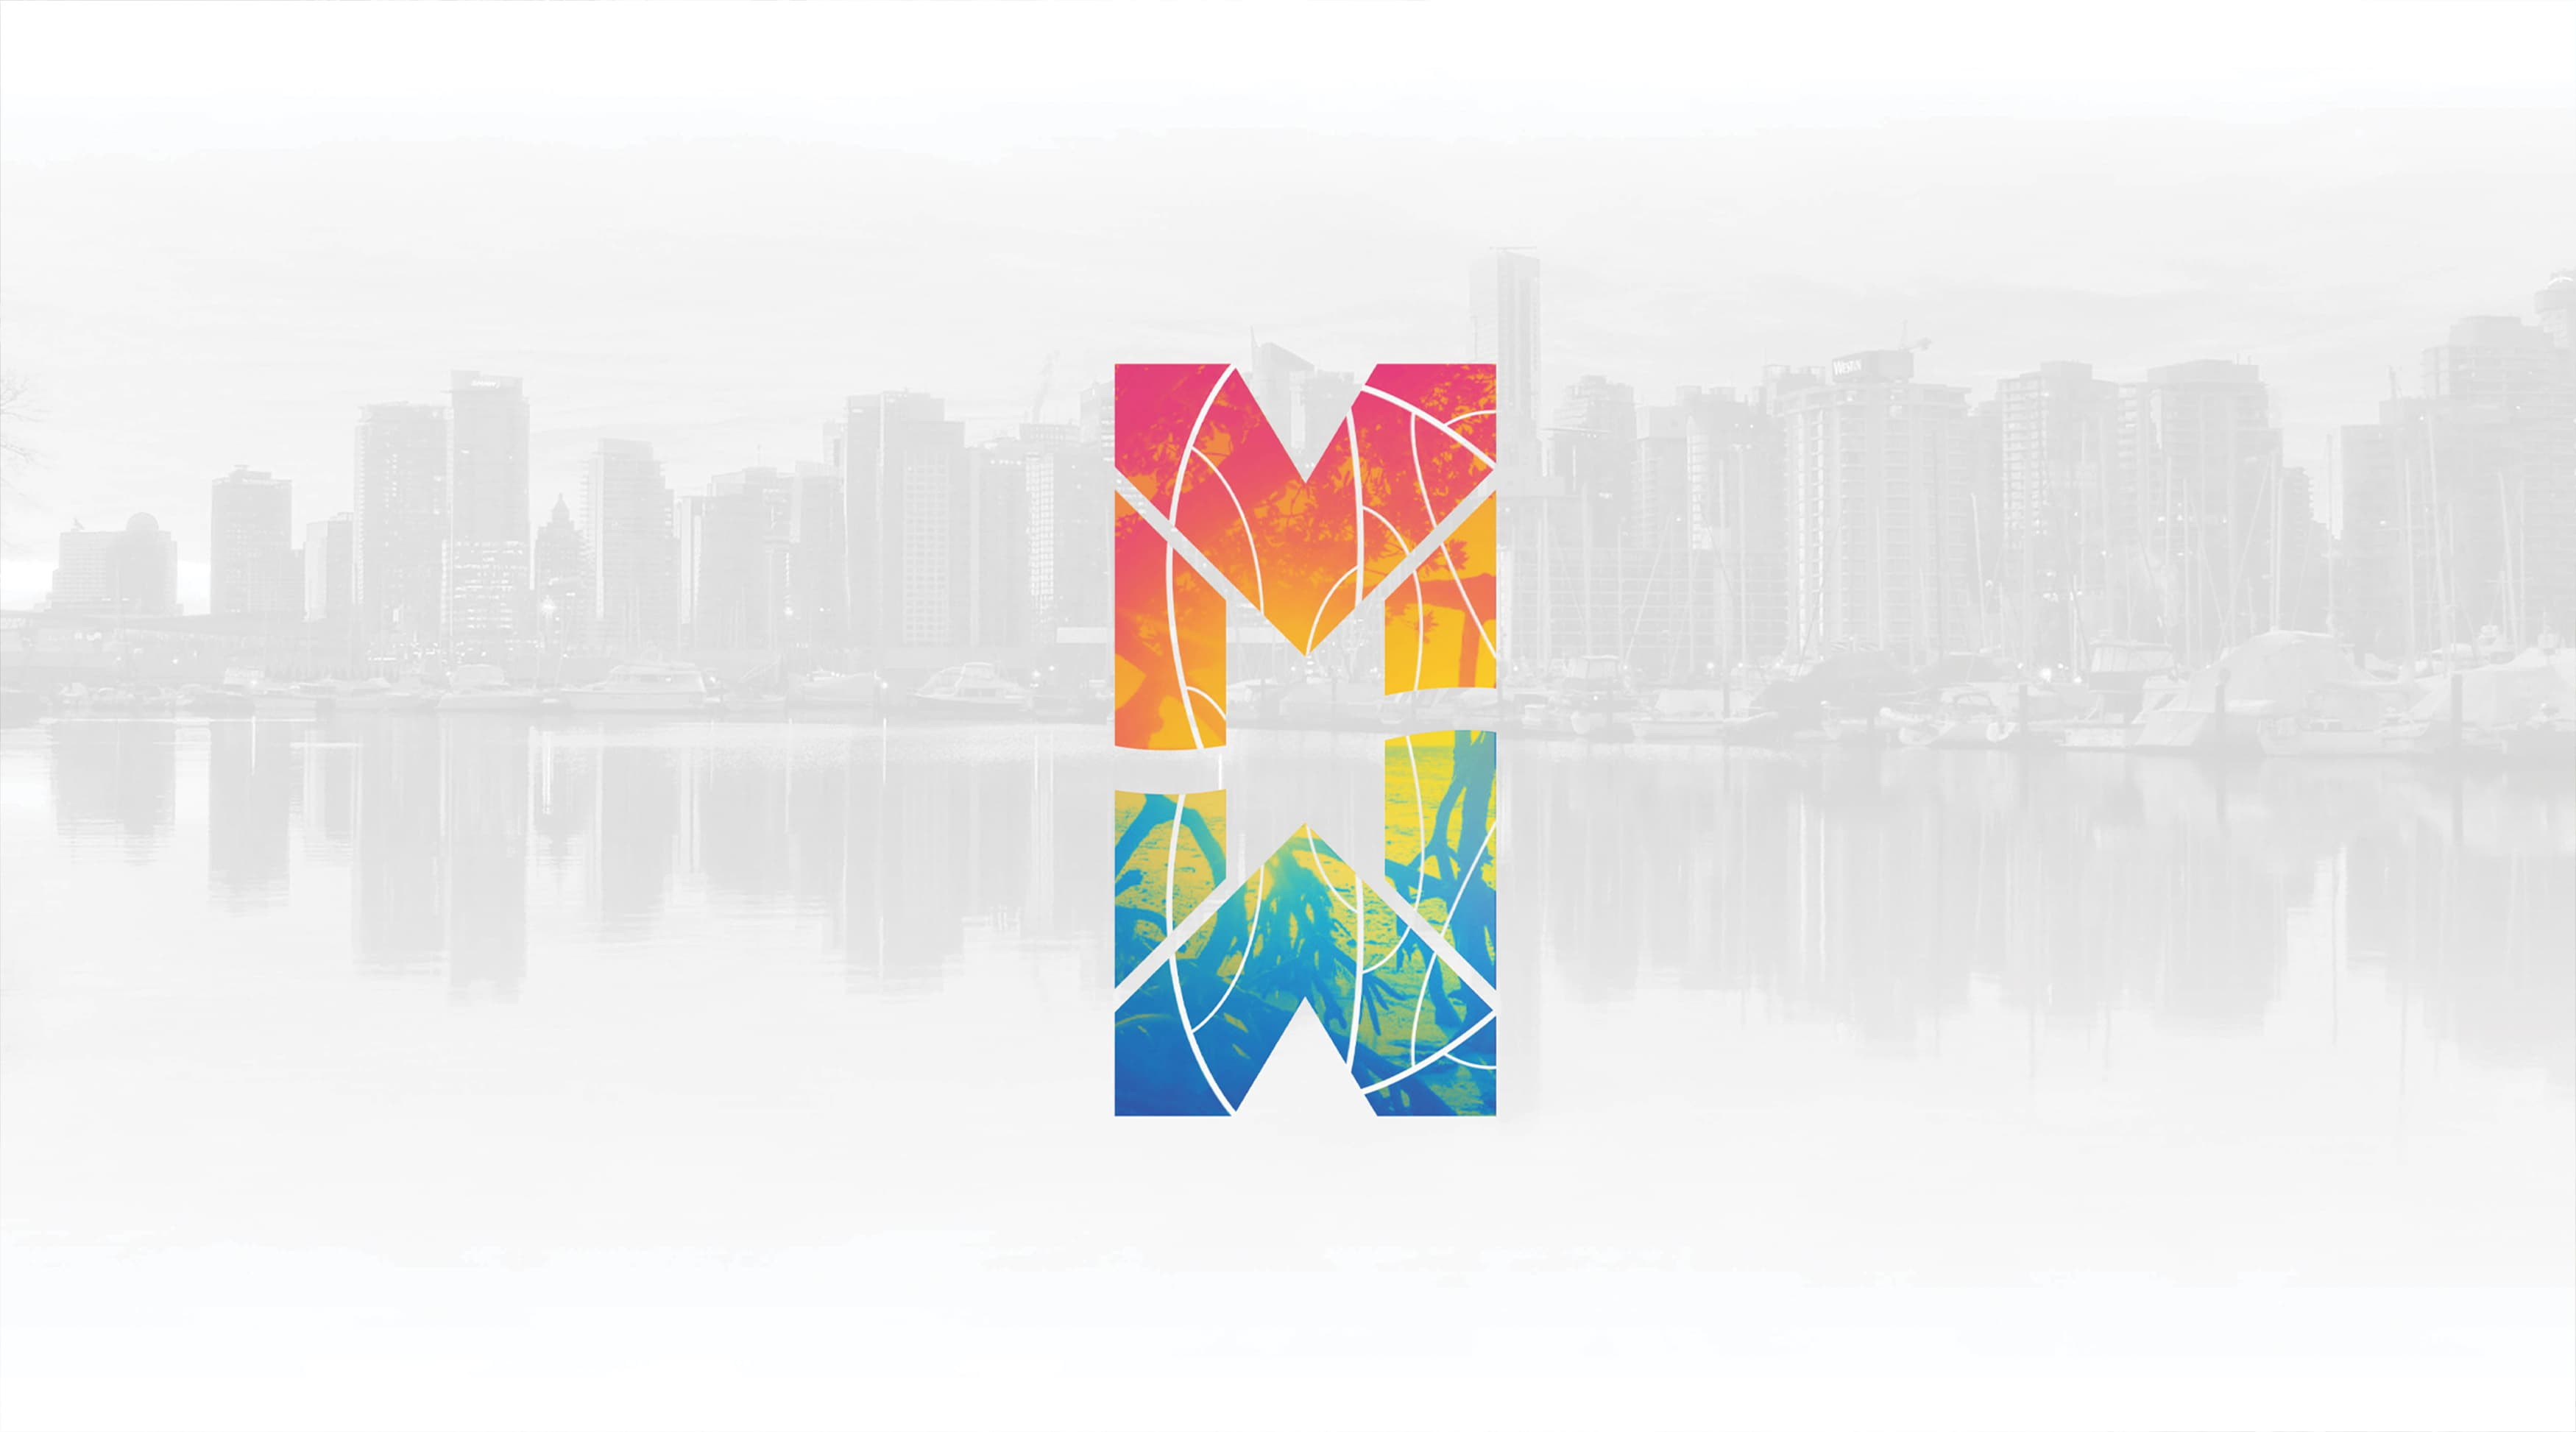 Civic Design, Transit Design, Waterfront Wayfinding Design, Streetscape Design, Park Wayfinding & Signage. Logo and Brand Design.